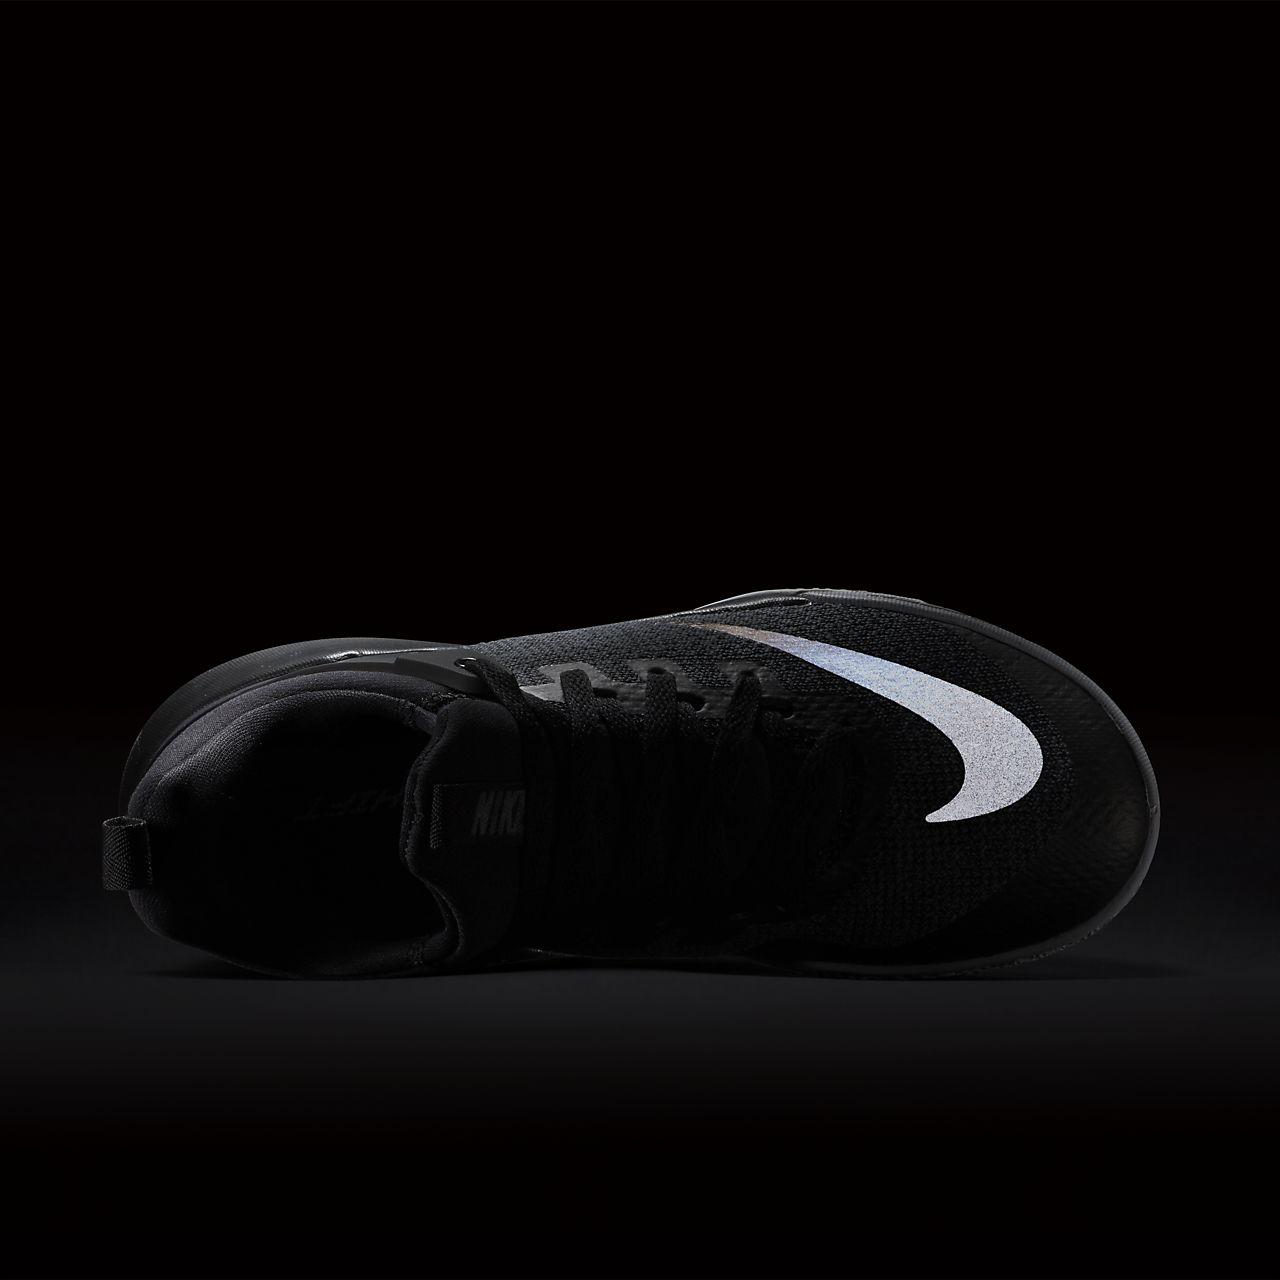 competitive price 08381 a309a scarpa da basket nike zoom shift nero/wolf grey/chrome 917731-001